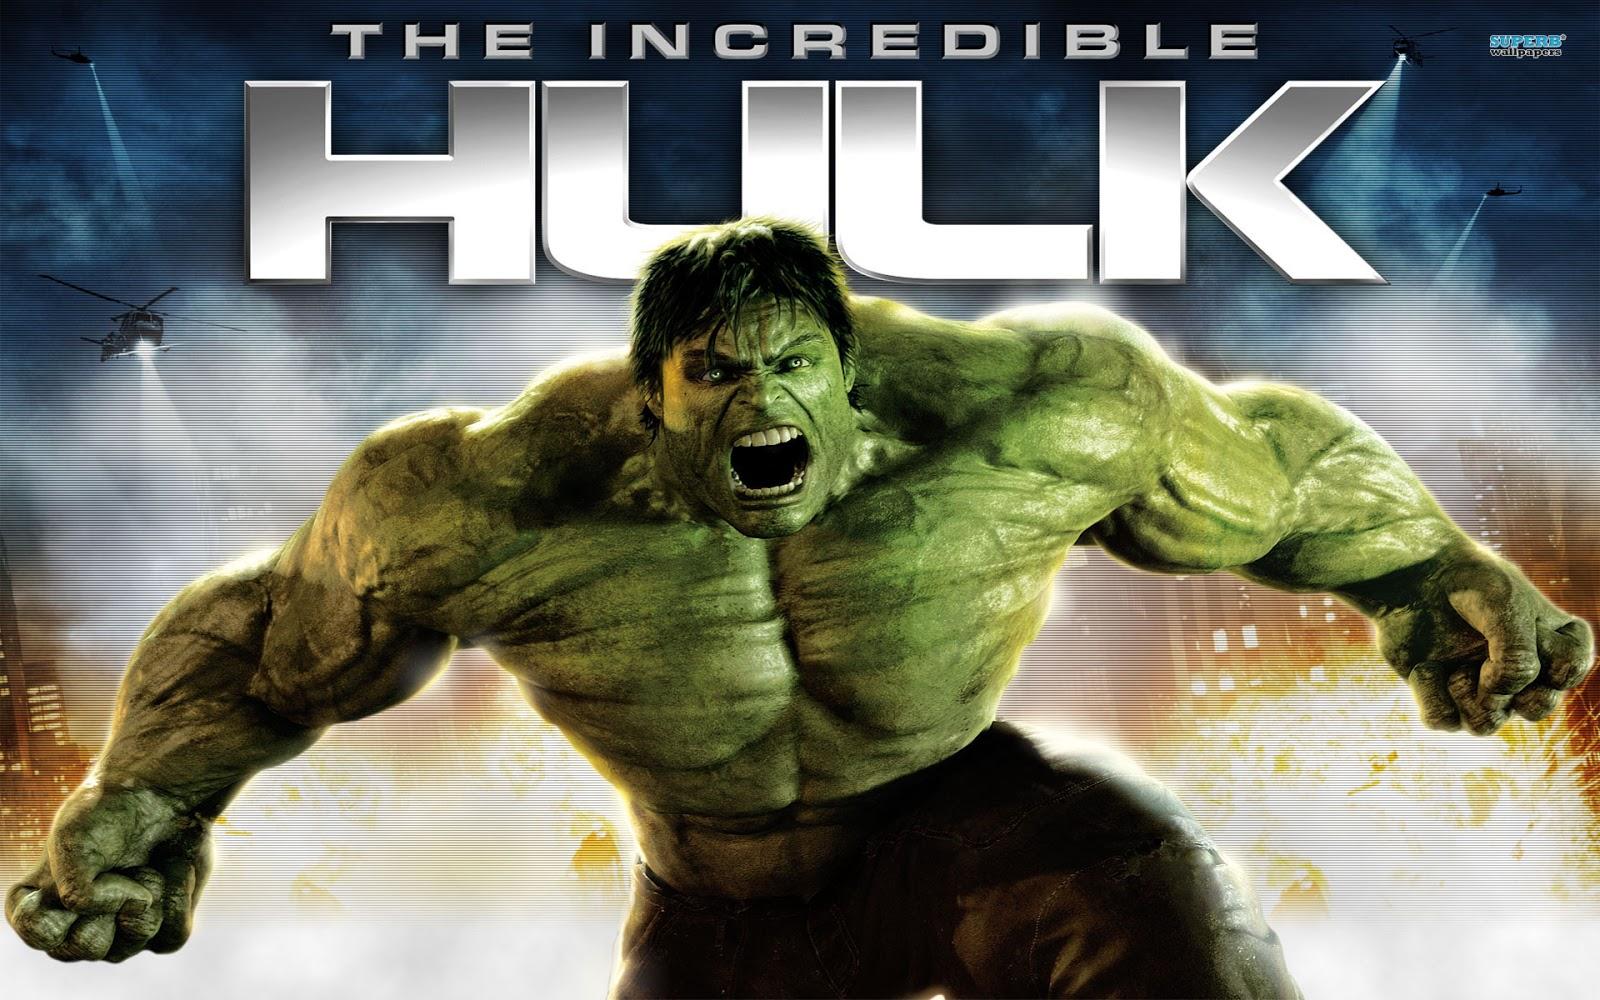 The incredible hulk pc game free download.